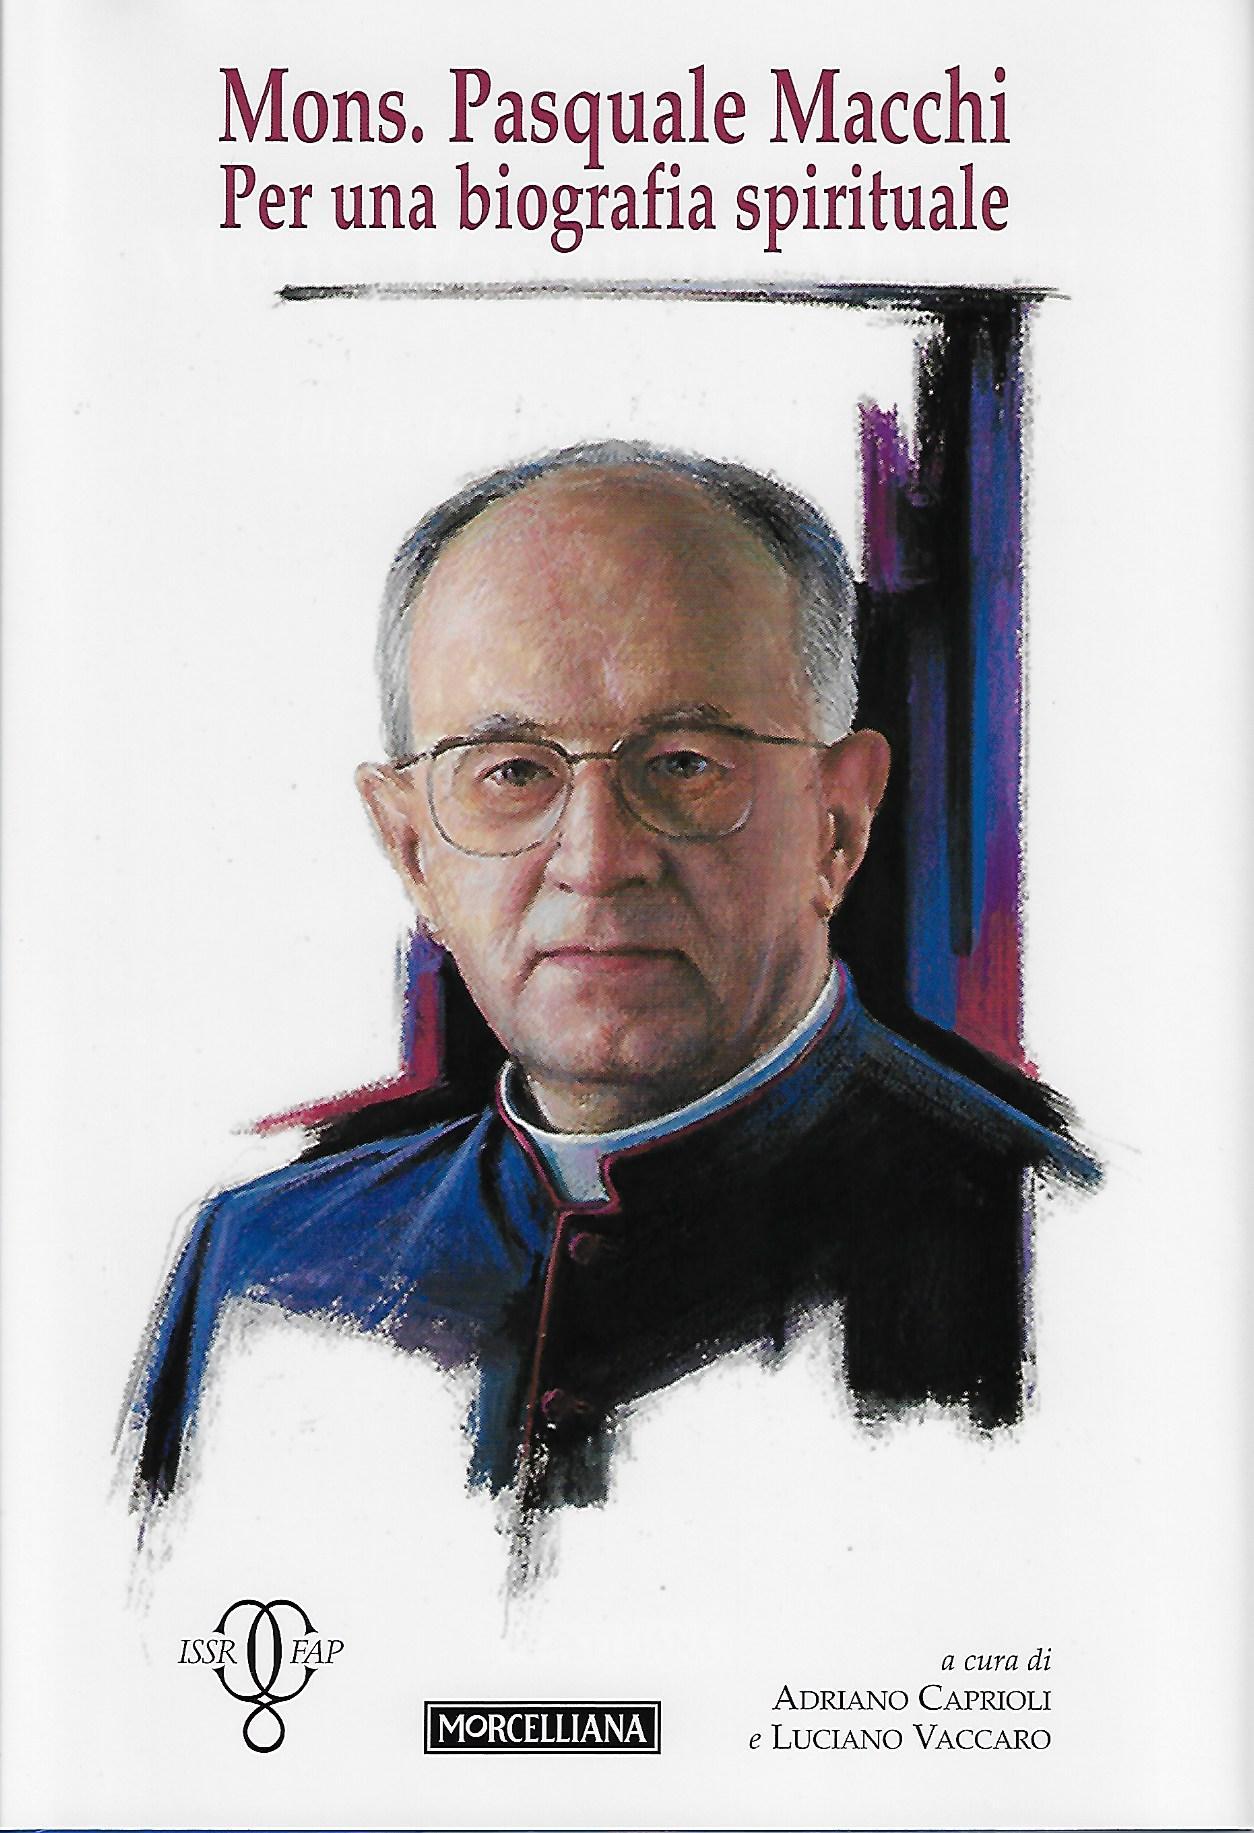 Mons. Pasquale Macchi. Per una biografia spirituale